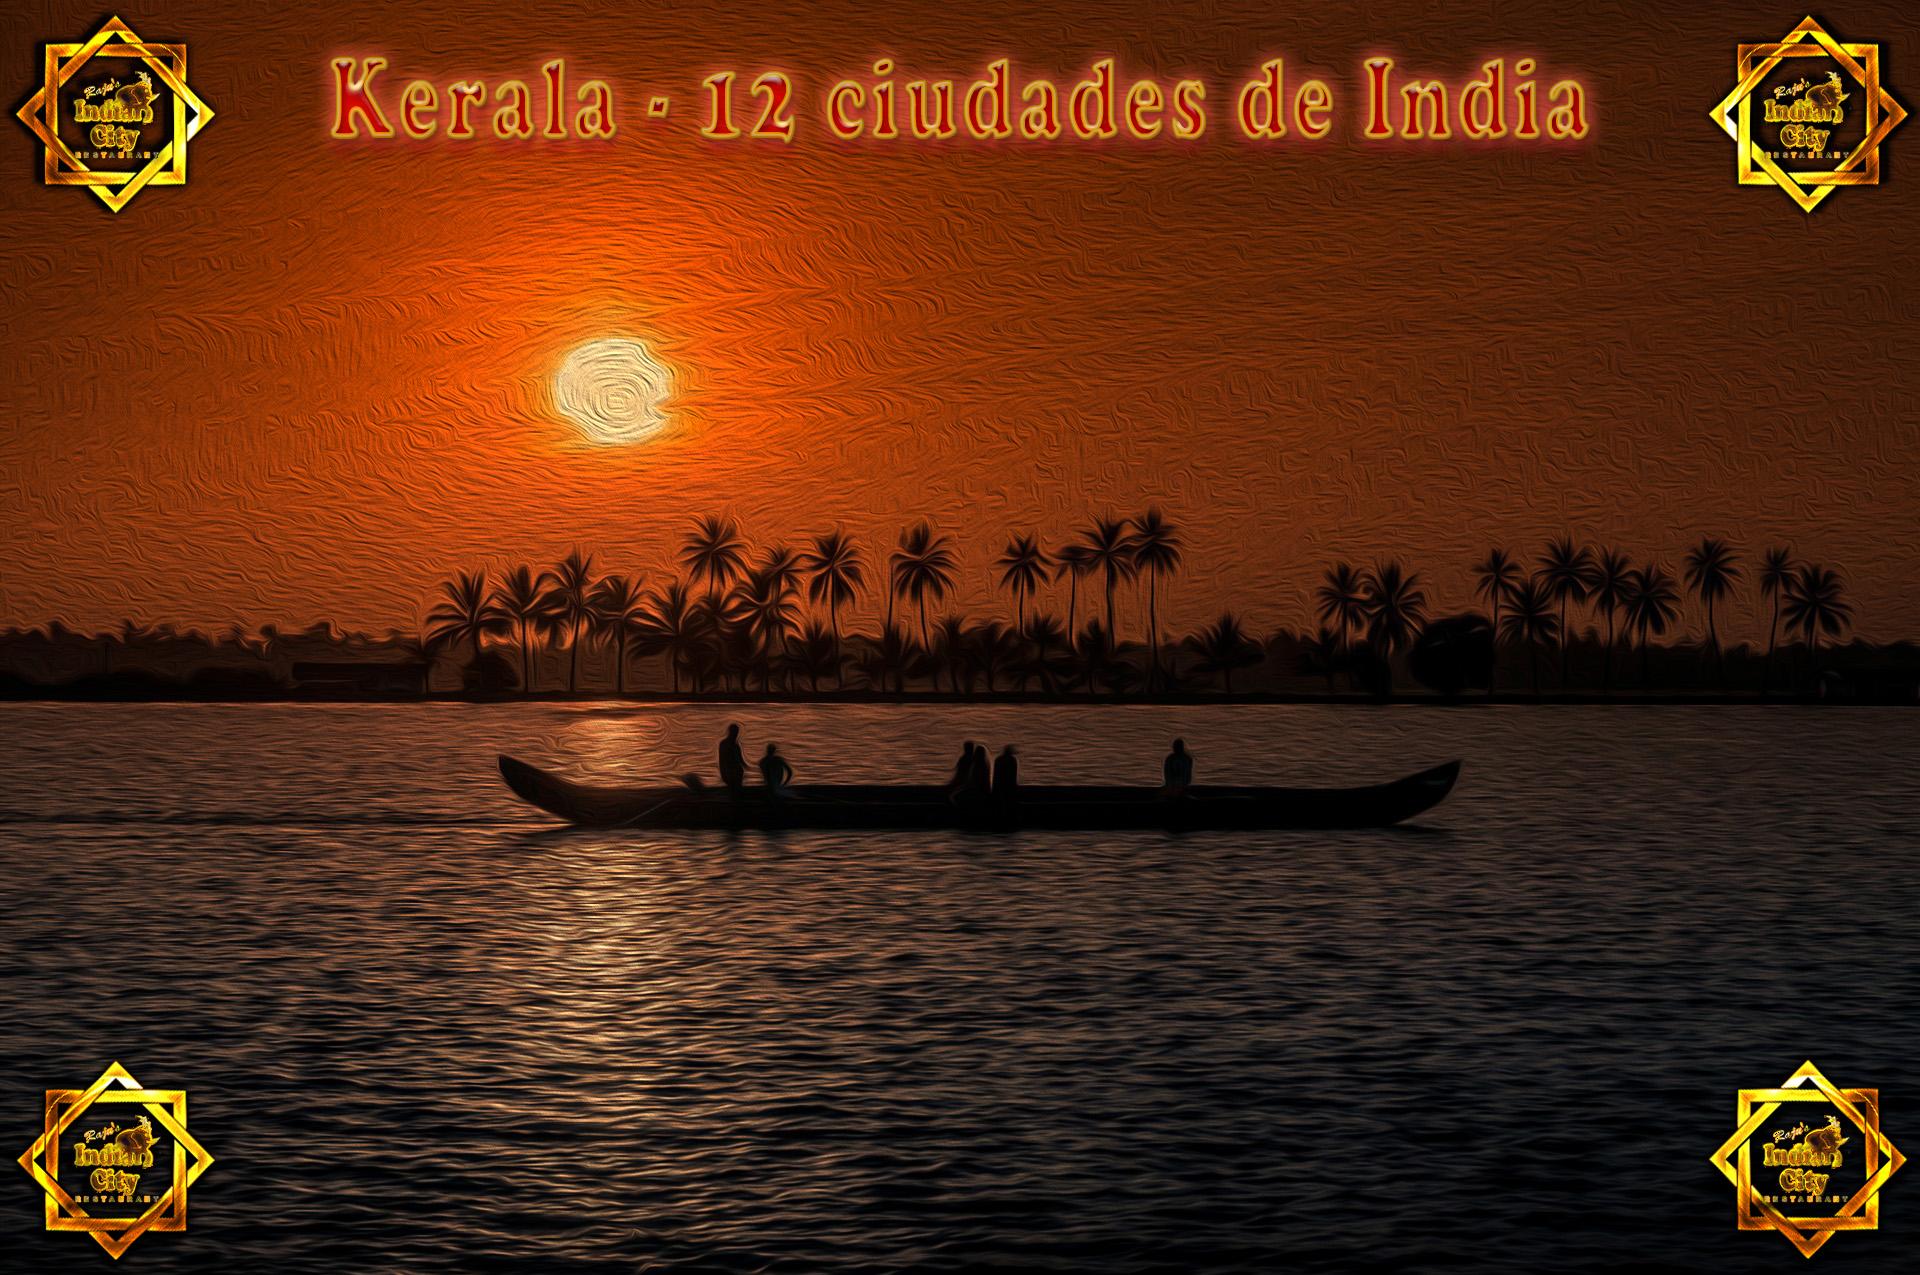 Kerala – 12 Ciudades de India